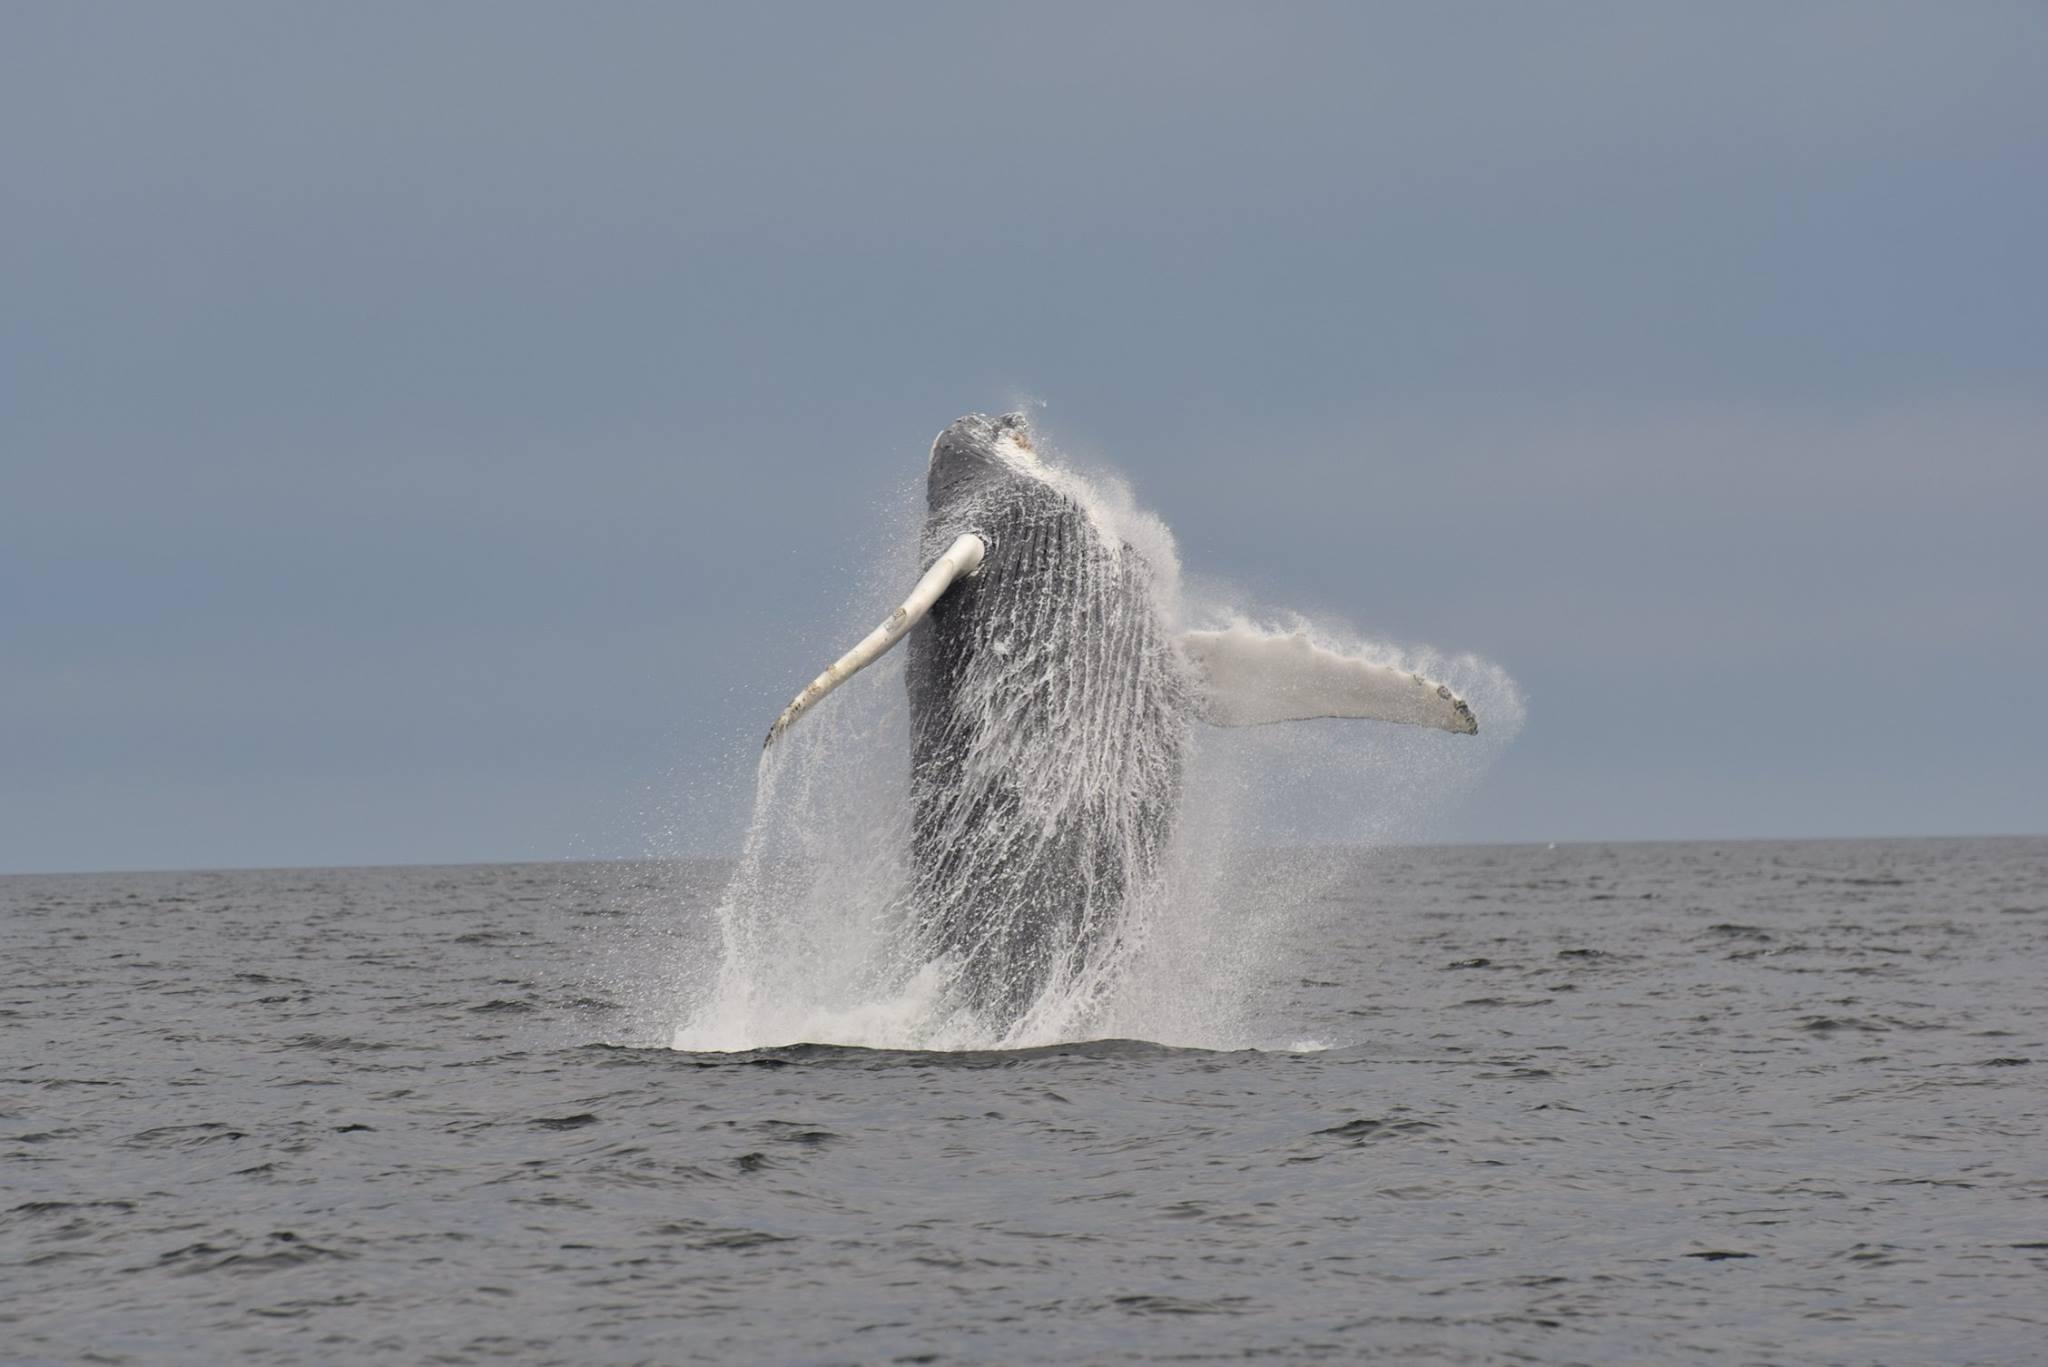 Baleine à bosse 12 Juillet 2016.jpg